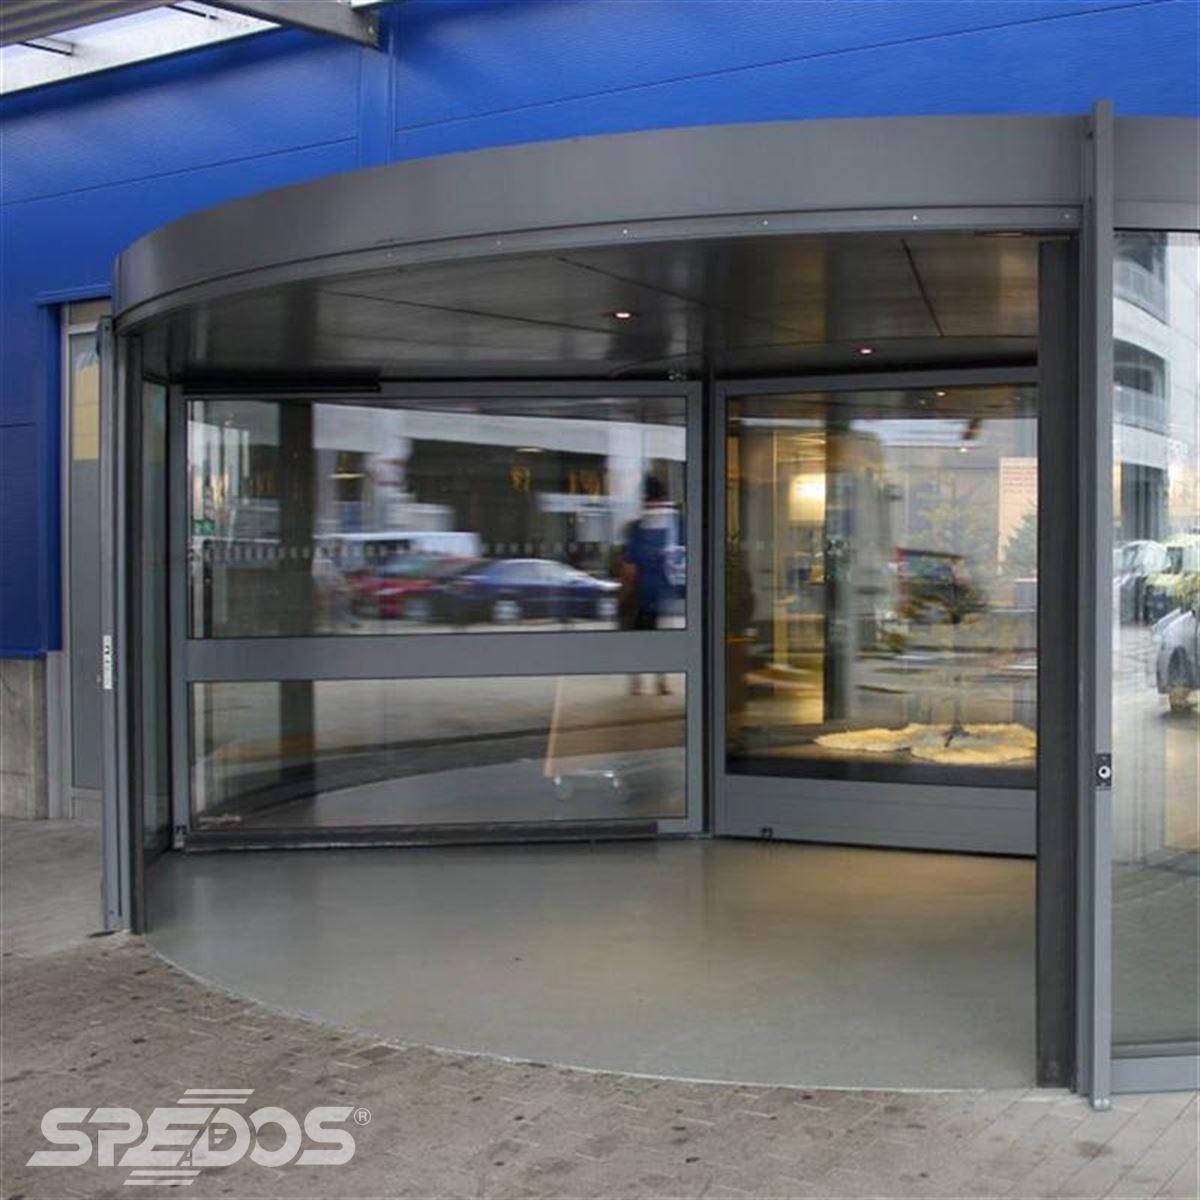 Vstup do budovy IKEA od Spedosu